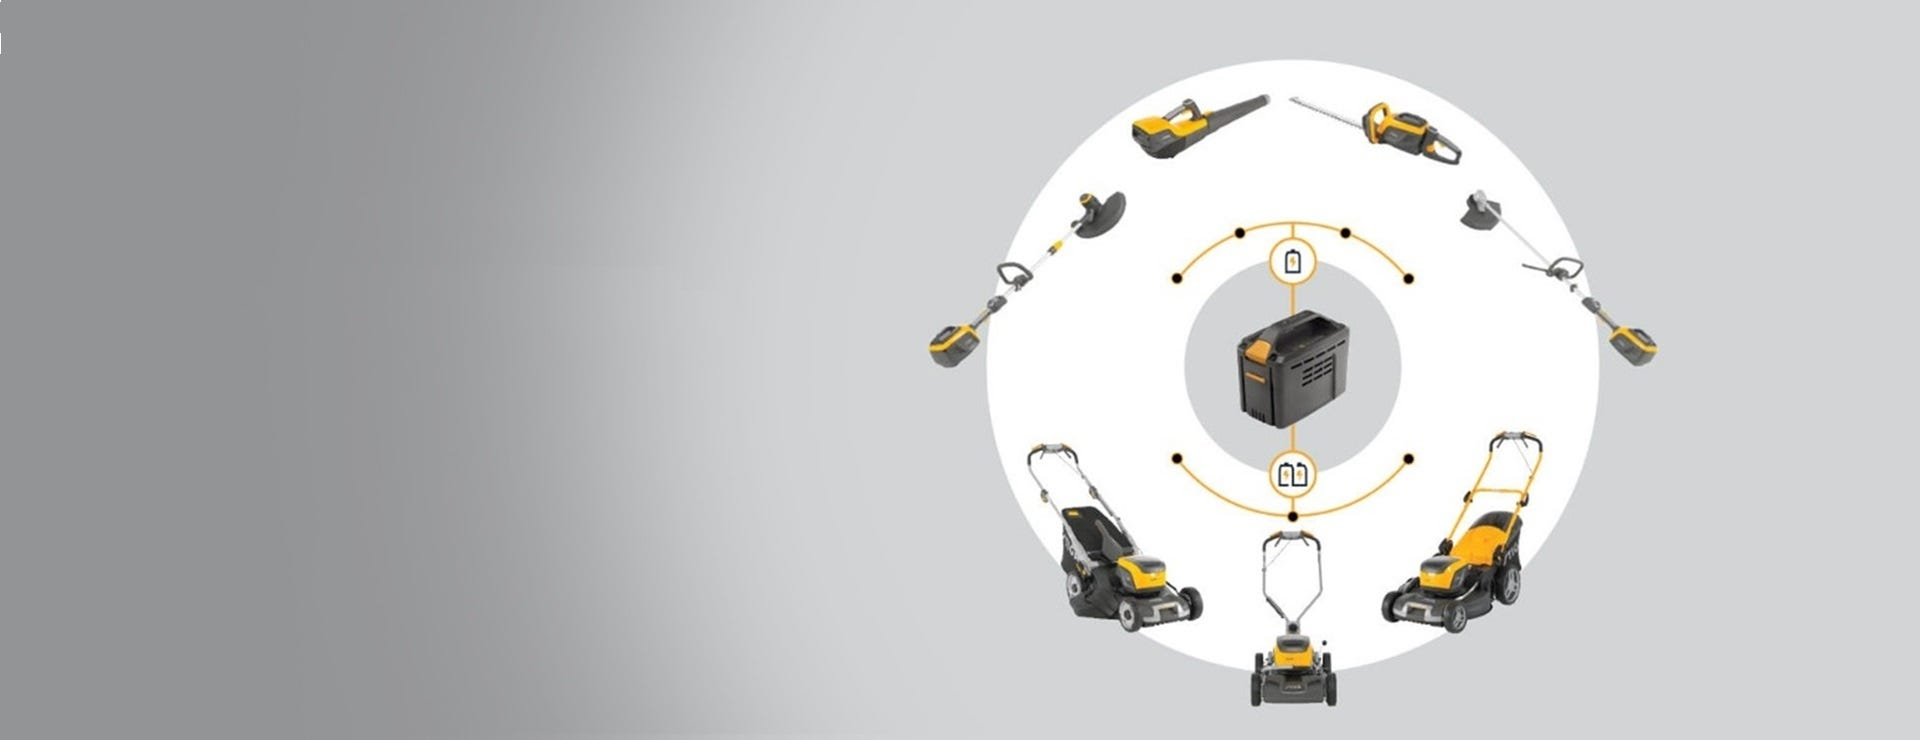 500-series-batterij-systeem-accu-tuinmachines